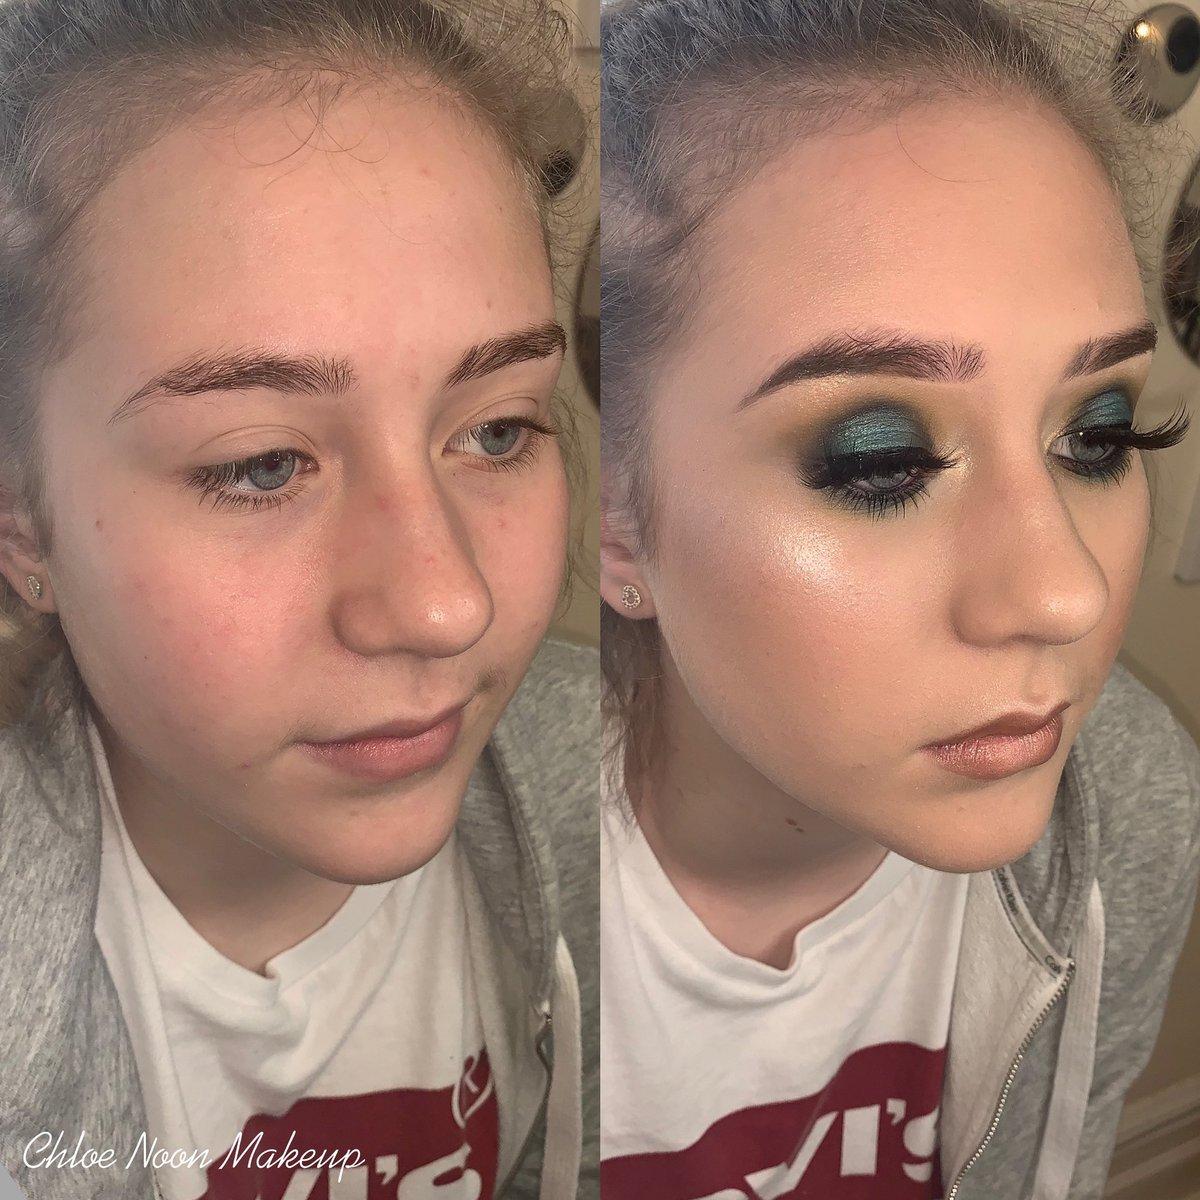 93d266fe2 Makeup £25 with lashes • Pin curls £10 • Spray tans £15  •pic.twitter.com/c2pzlwLntS